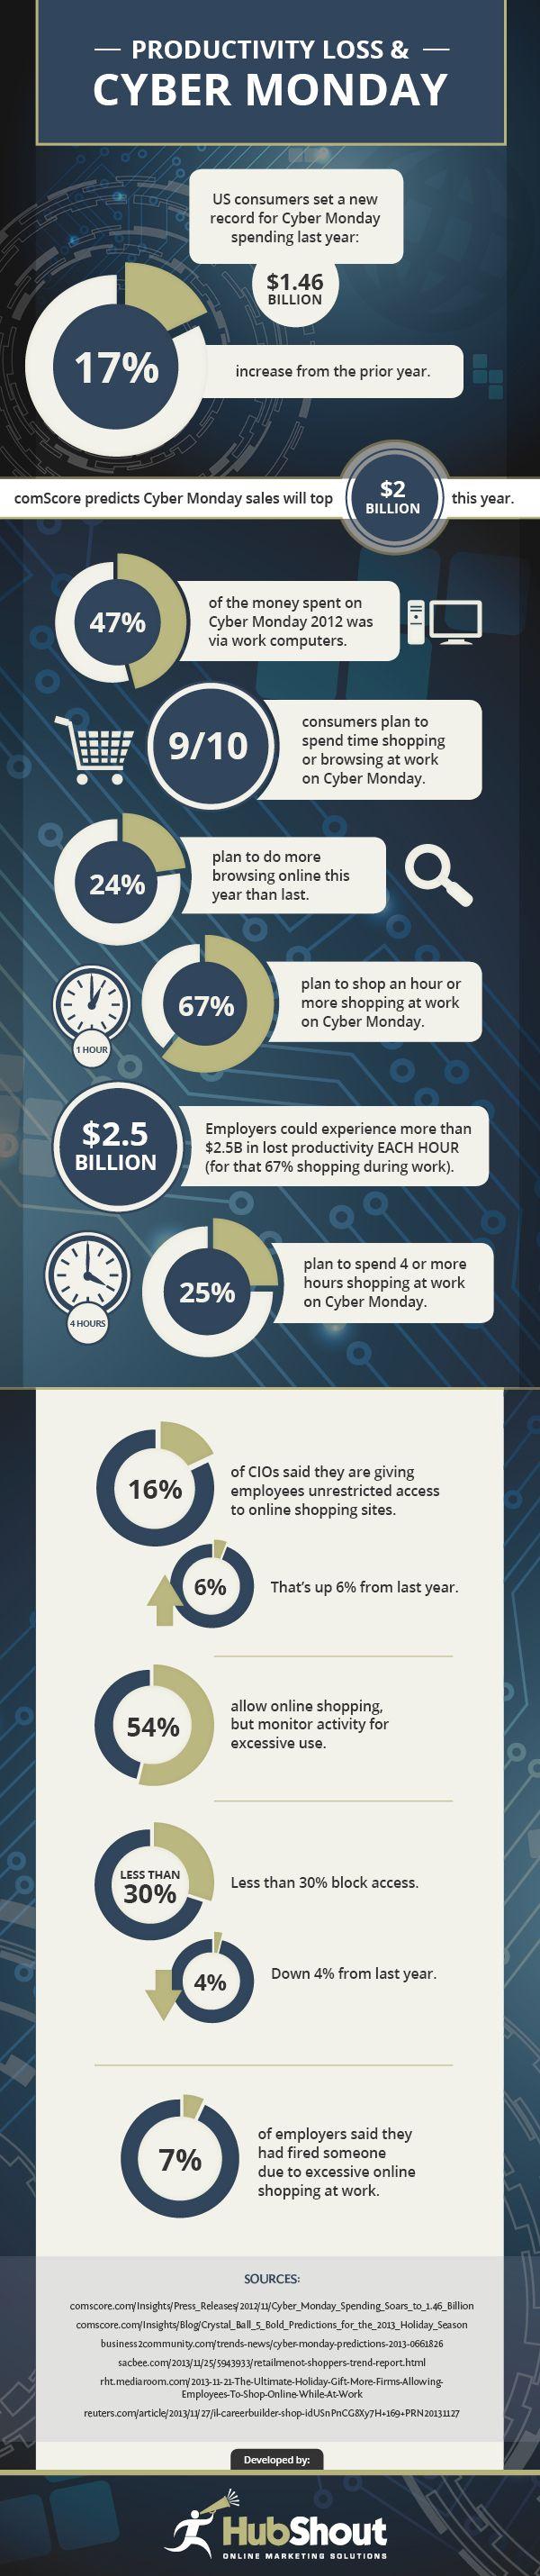 Productivity loss & cyber monday #infografia #infographic #ecommerce